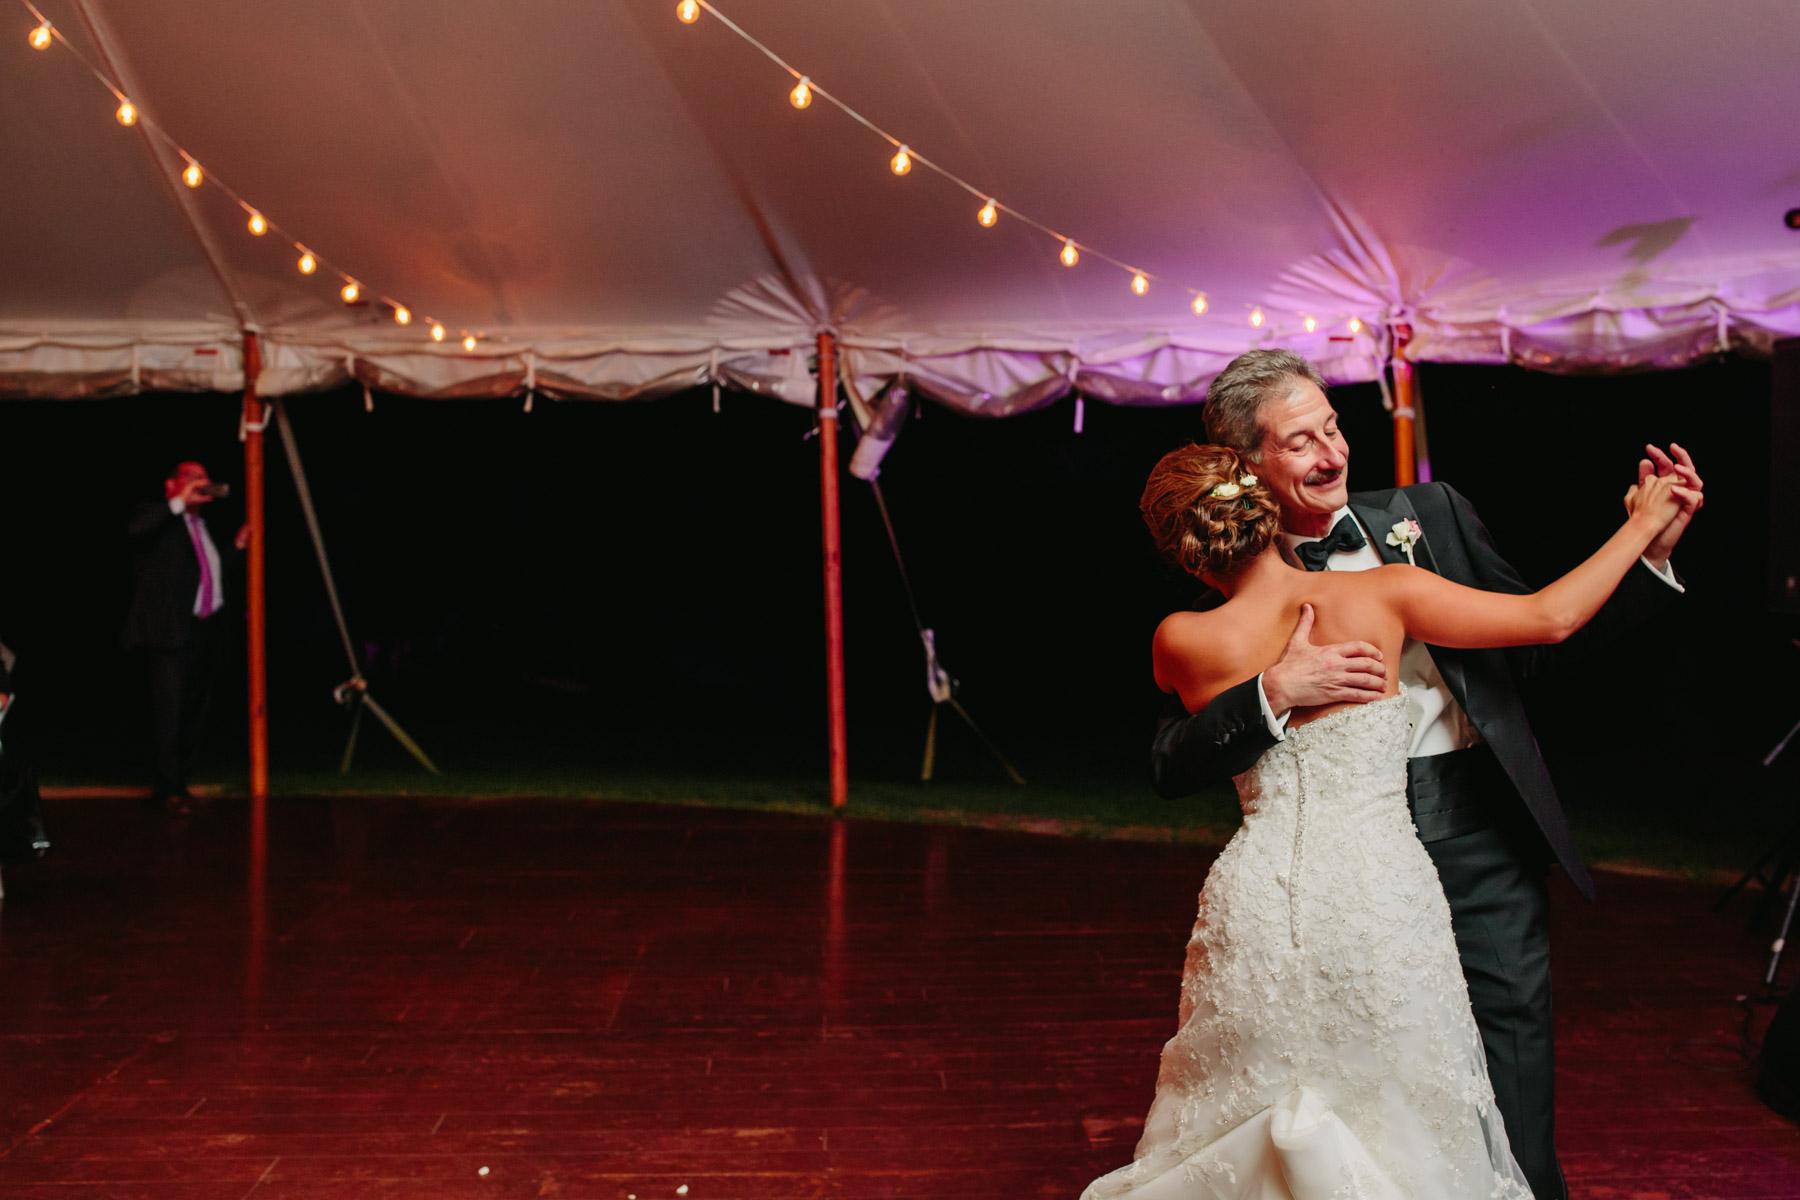 New England Wedding Photographer 28 Documentary Wedding Photographer Kerri Green